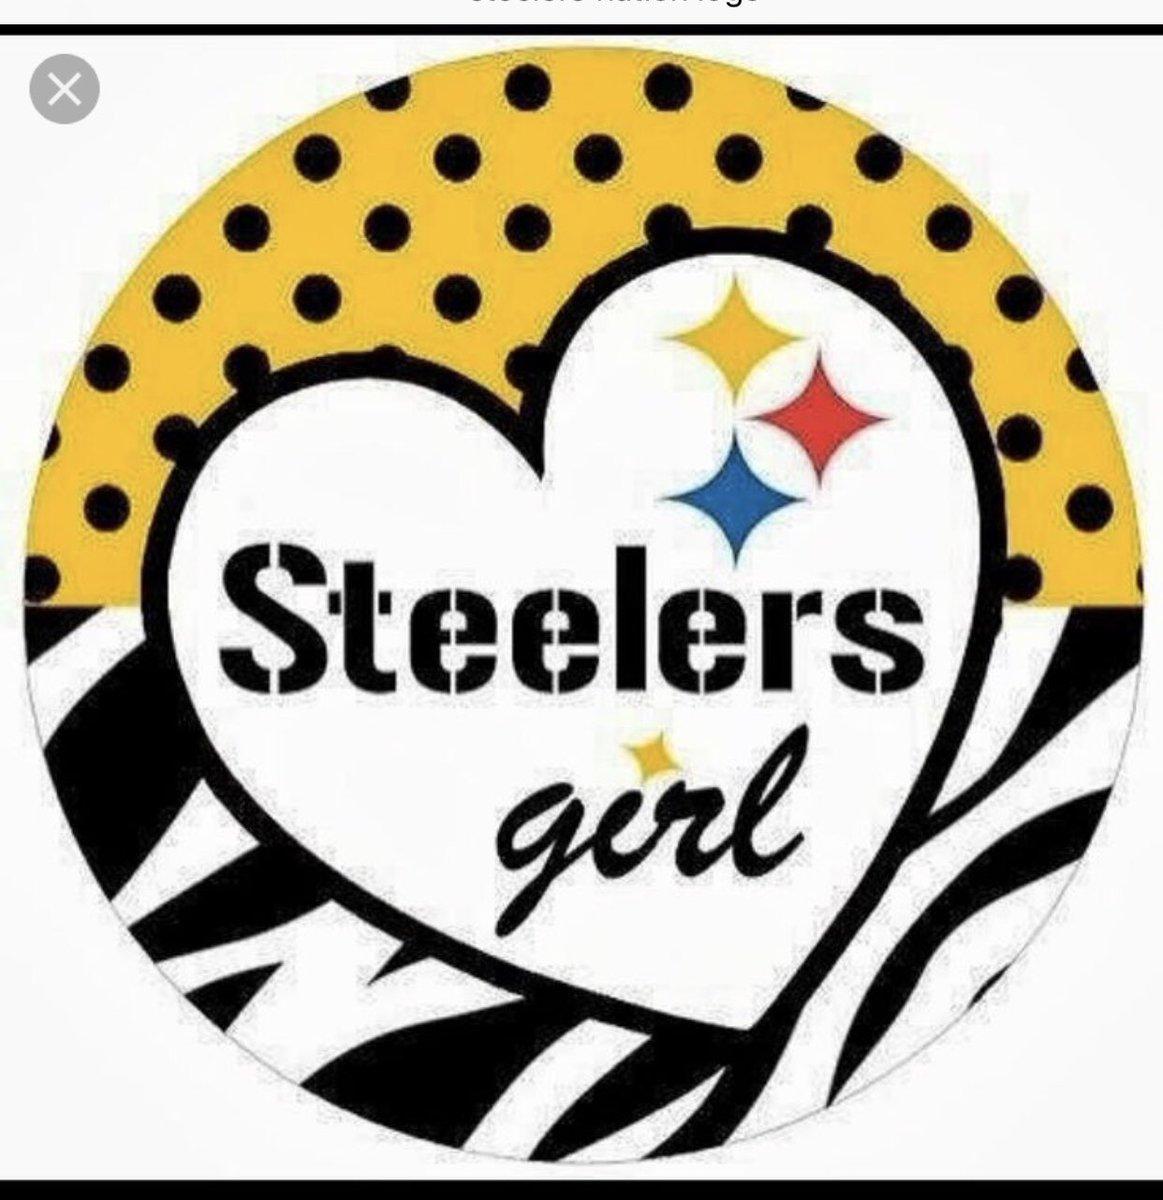 Steelers Logo Clipart At GetDrawings.com